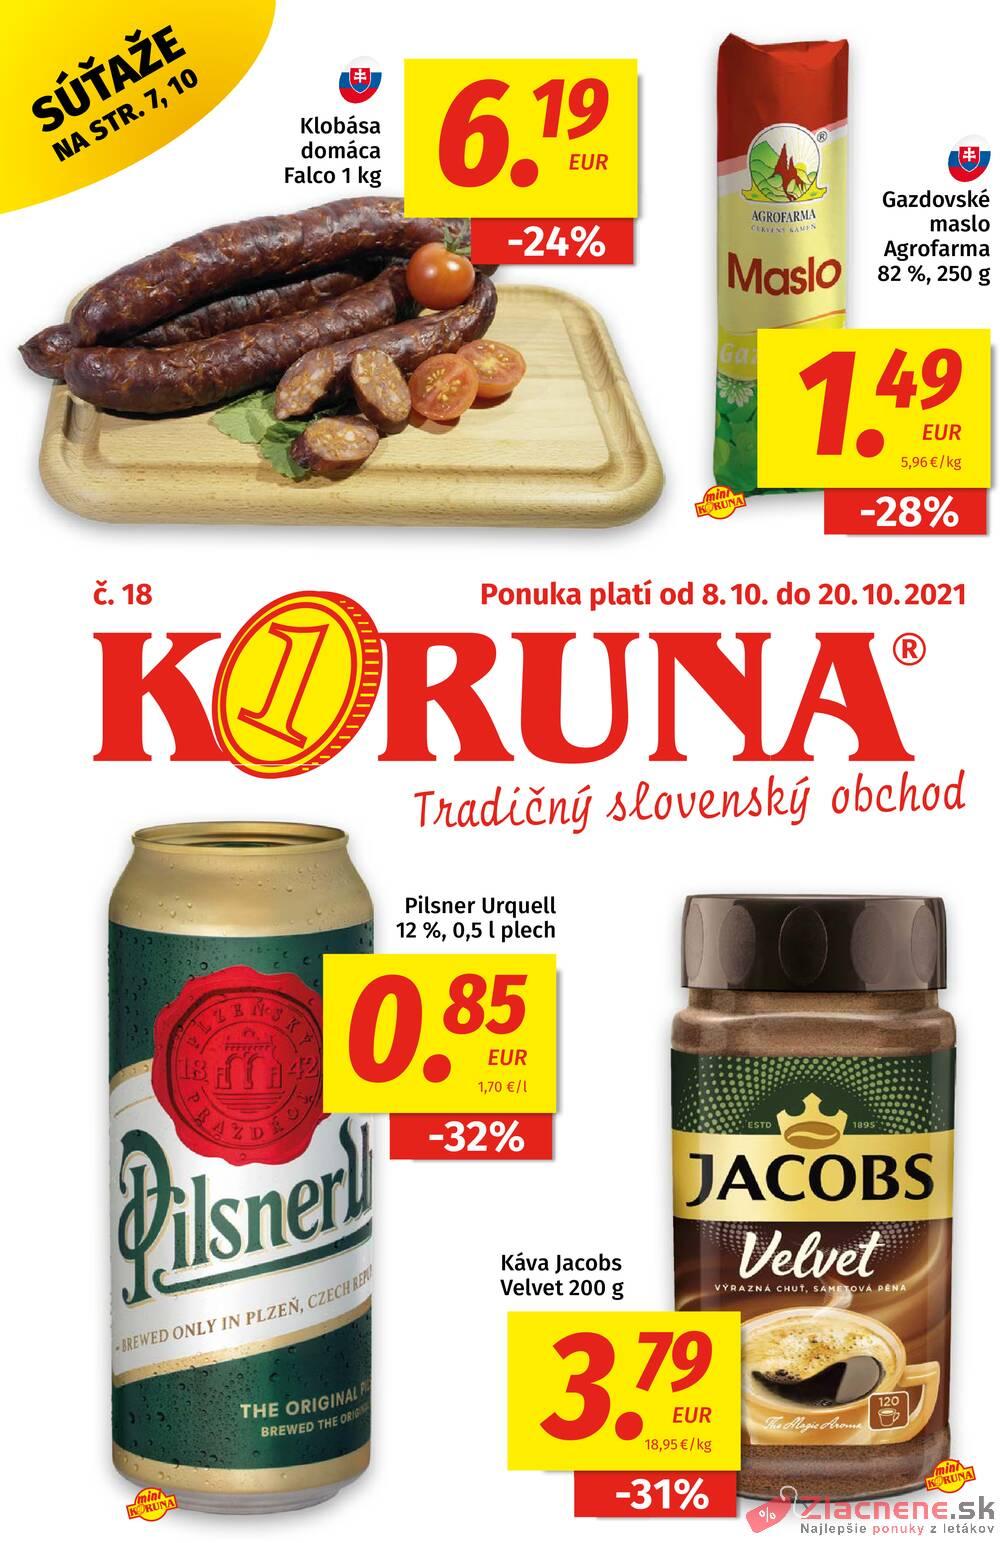 Leták KORUNA - Potraviny KORUNA od 8.10. do 20.10.2021 - strana 1